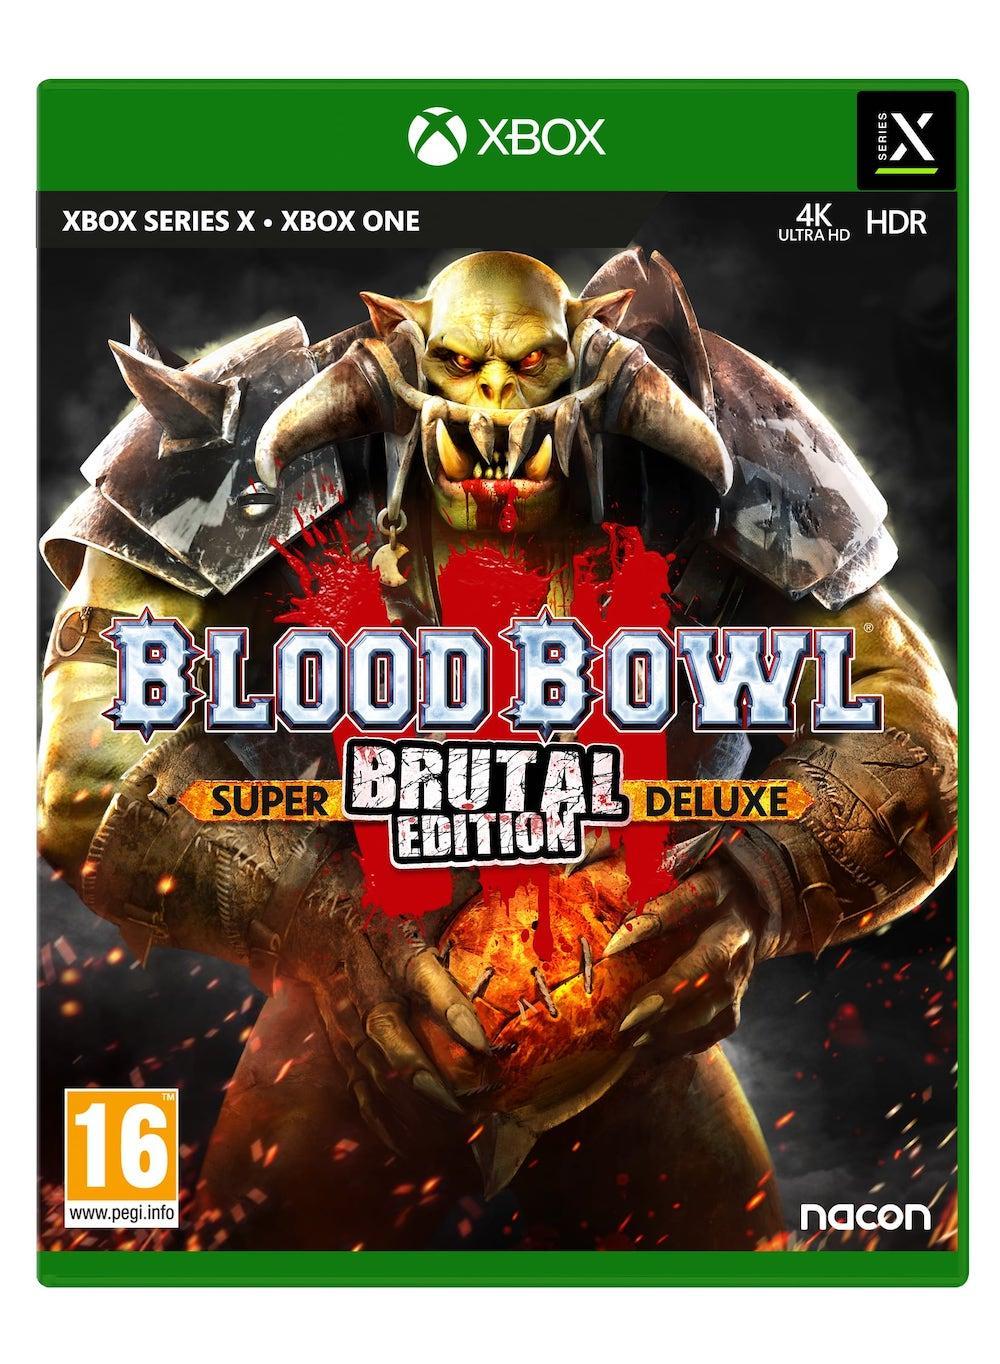 Blood Bowl 3 - XBOX ONE / XBOX SERIES X_1